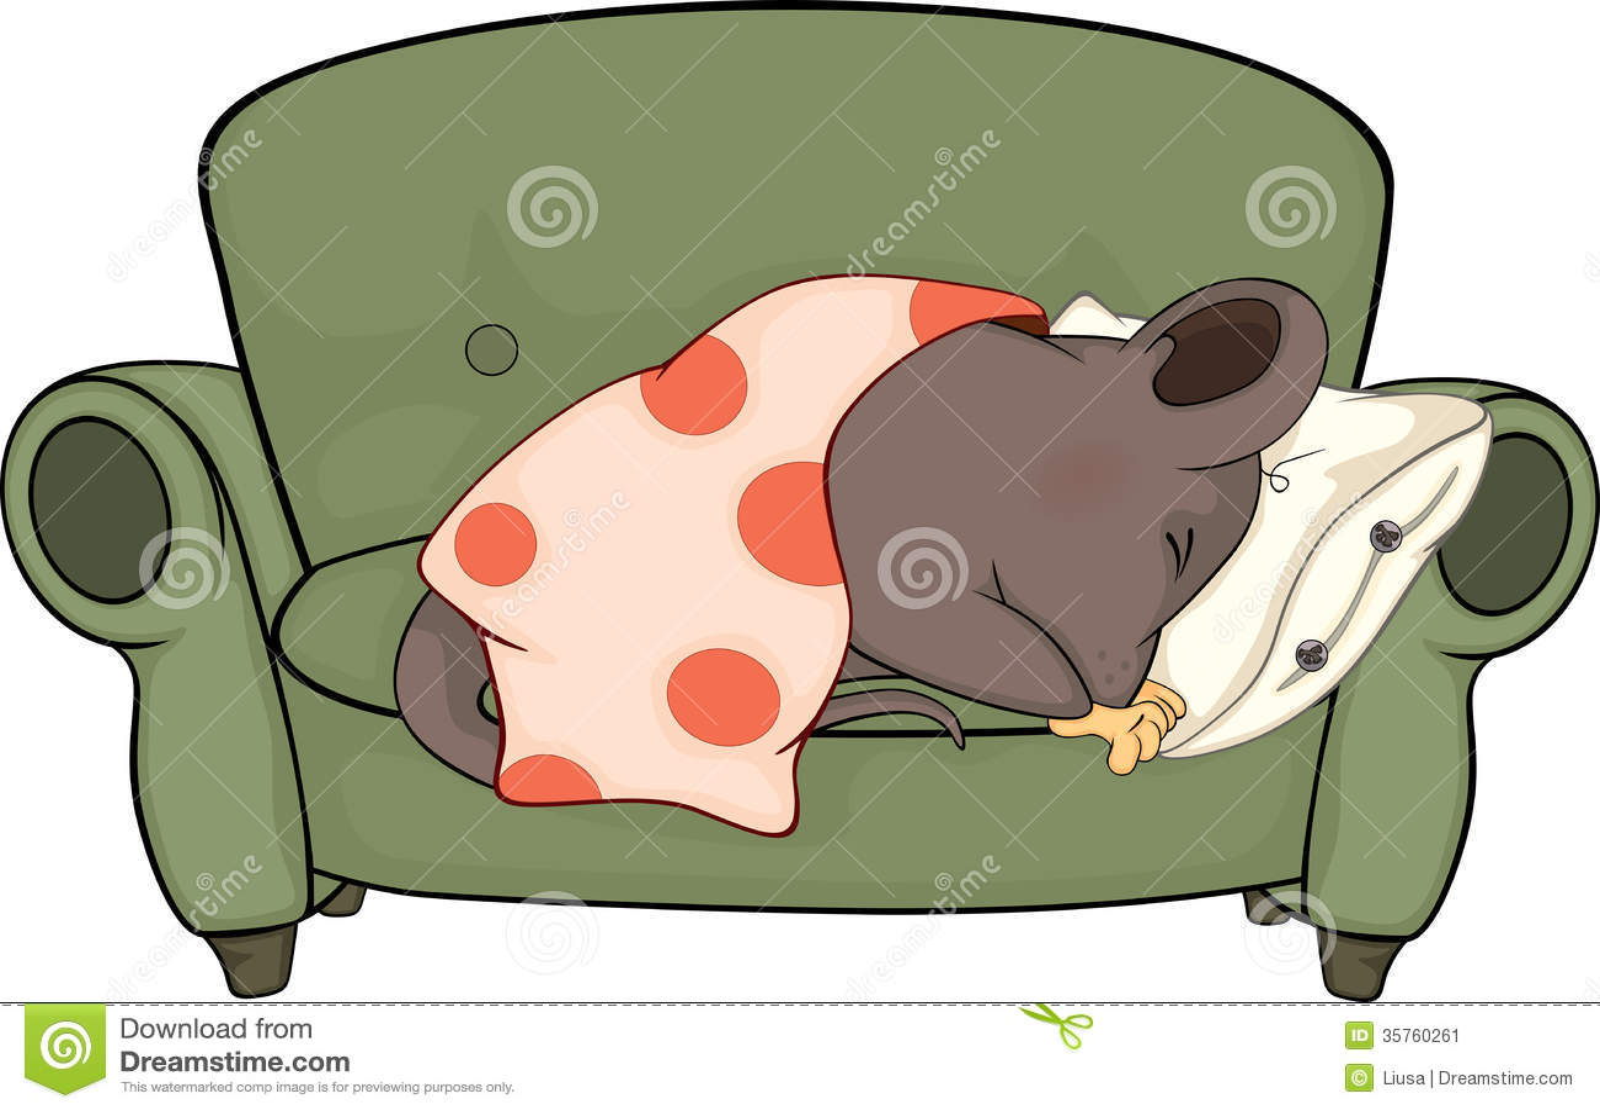 Sleeping Mouse Cartoon Stock Image Image 35760261